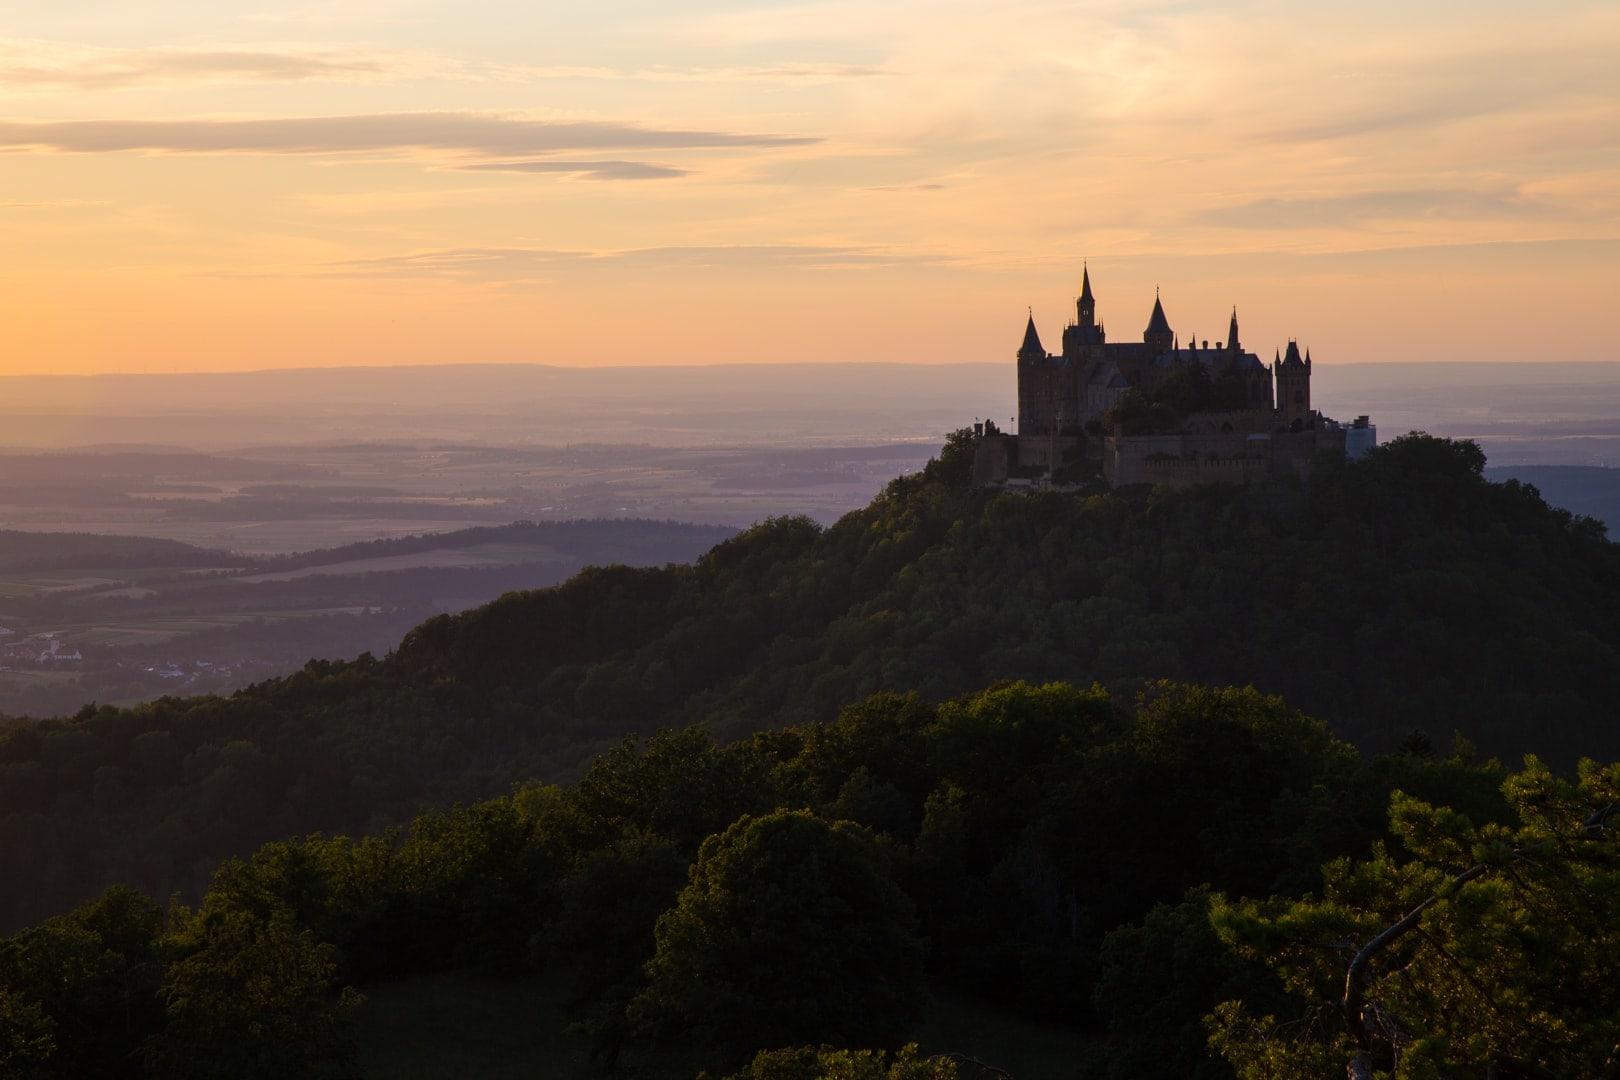 Auf Kometenjagd am Hohenzollern